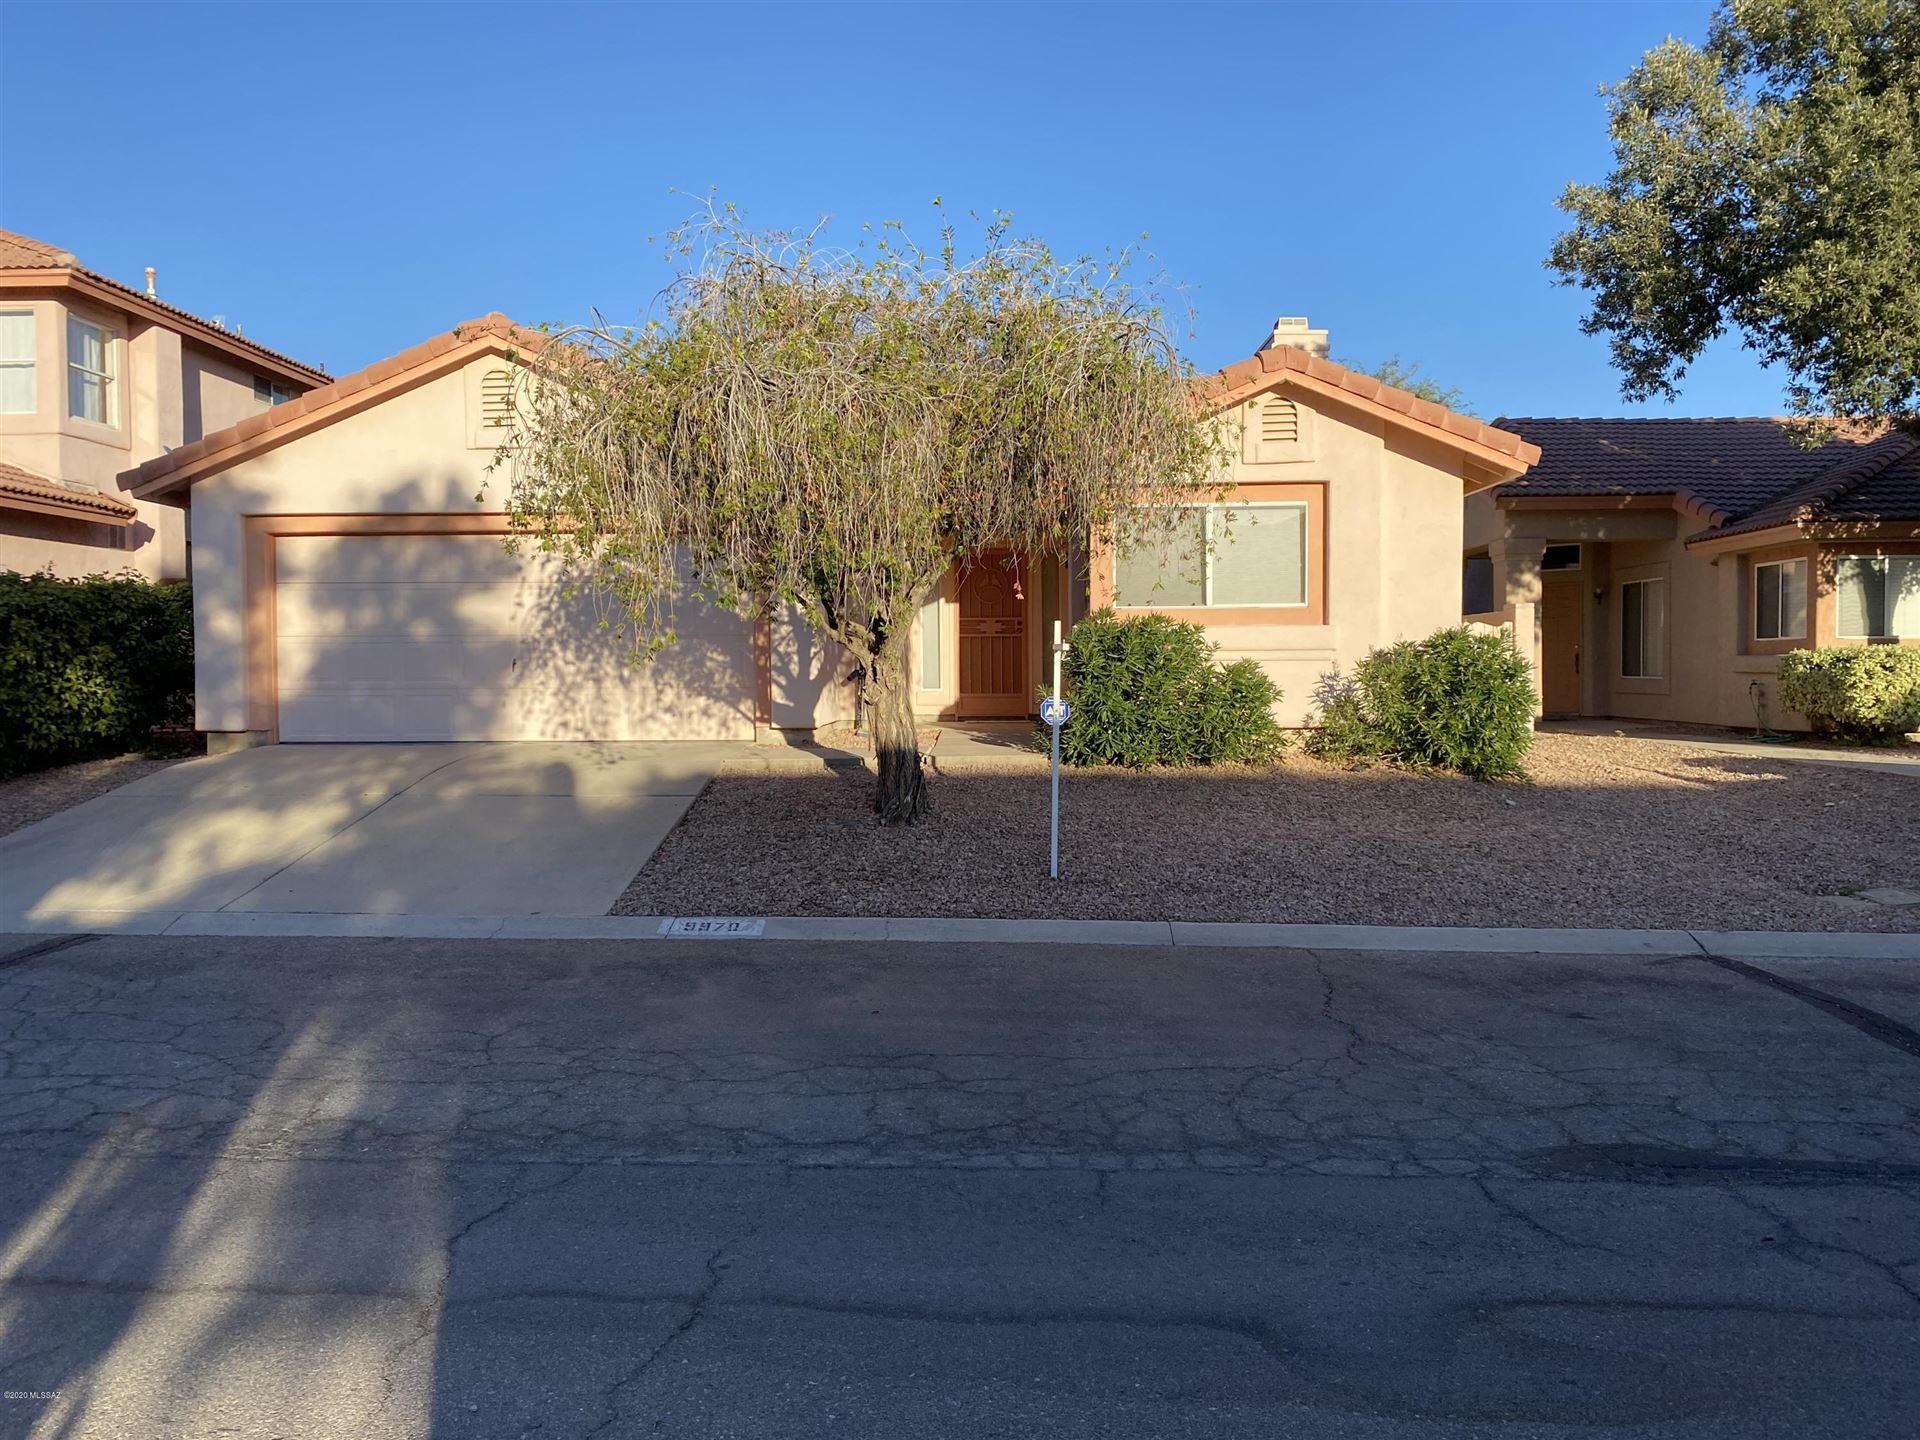 9970 N Black Mesa Trail, Tucson, AZ 85742 - #: 22026138